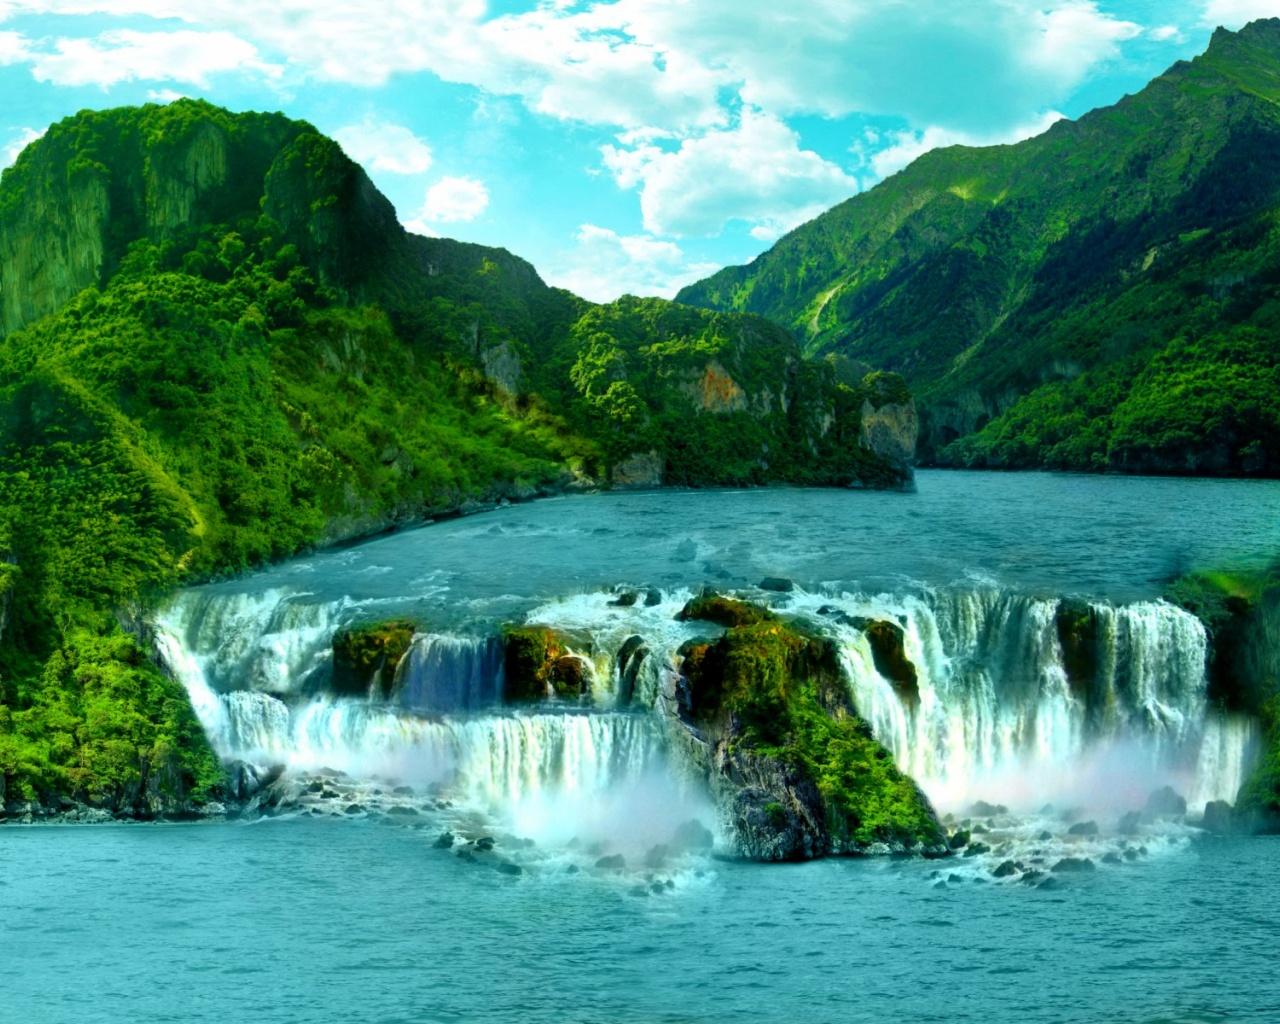 Hd Tropical Island Beach Paradise Wallpapers And Backgrounds: [68+] Tropical Desktop Wallpaper On WallpaperSafari